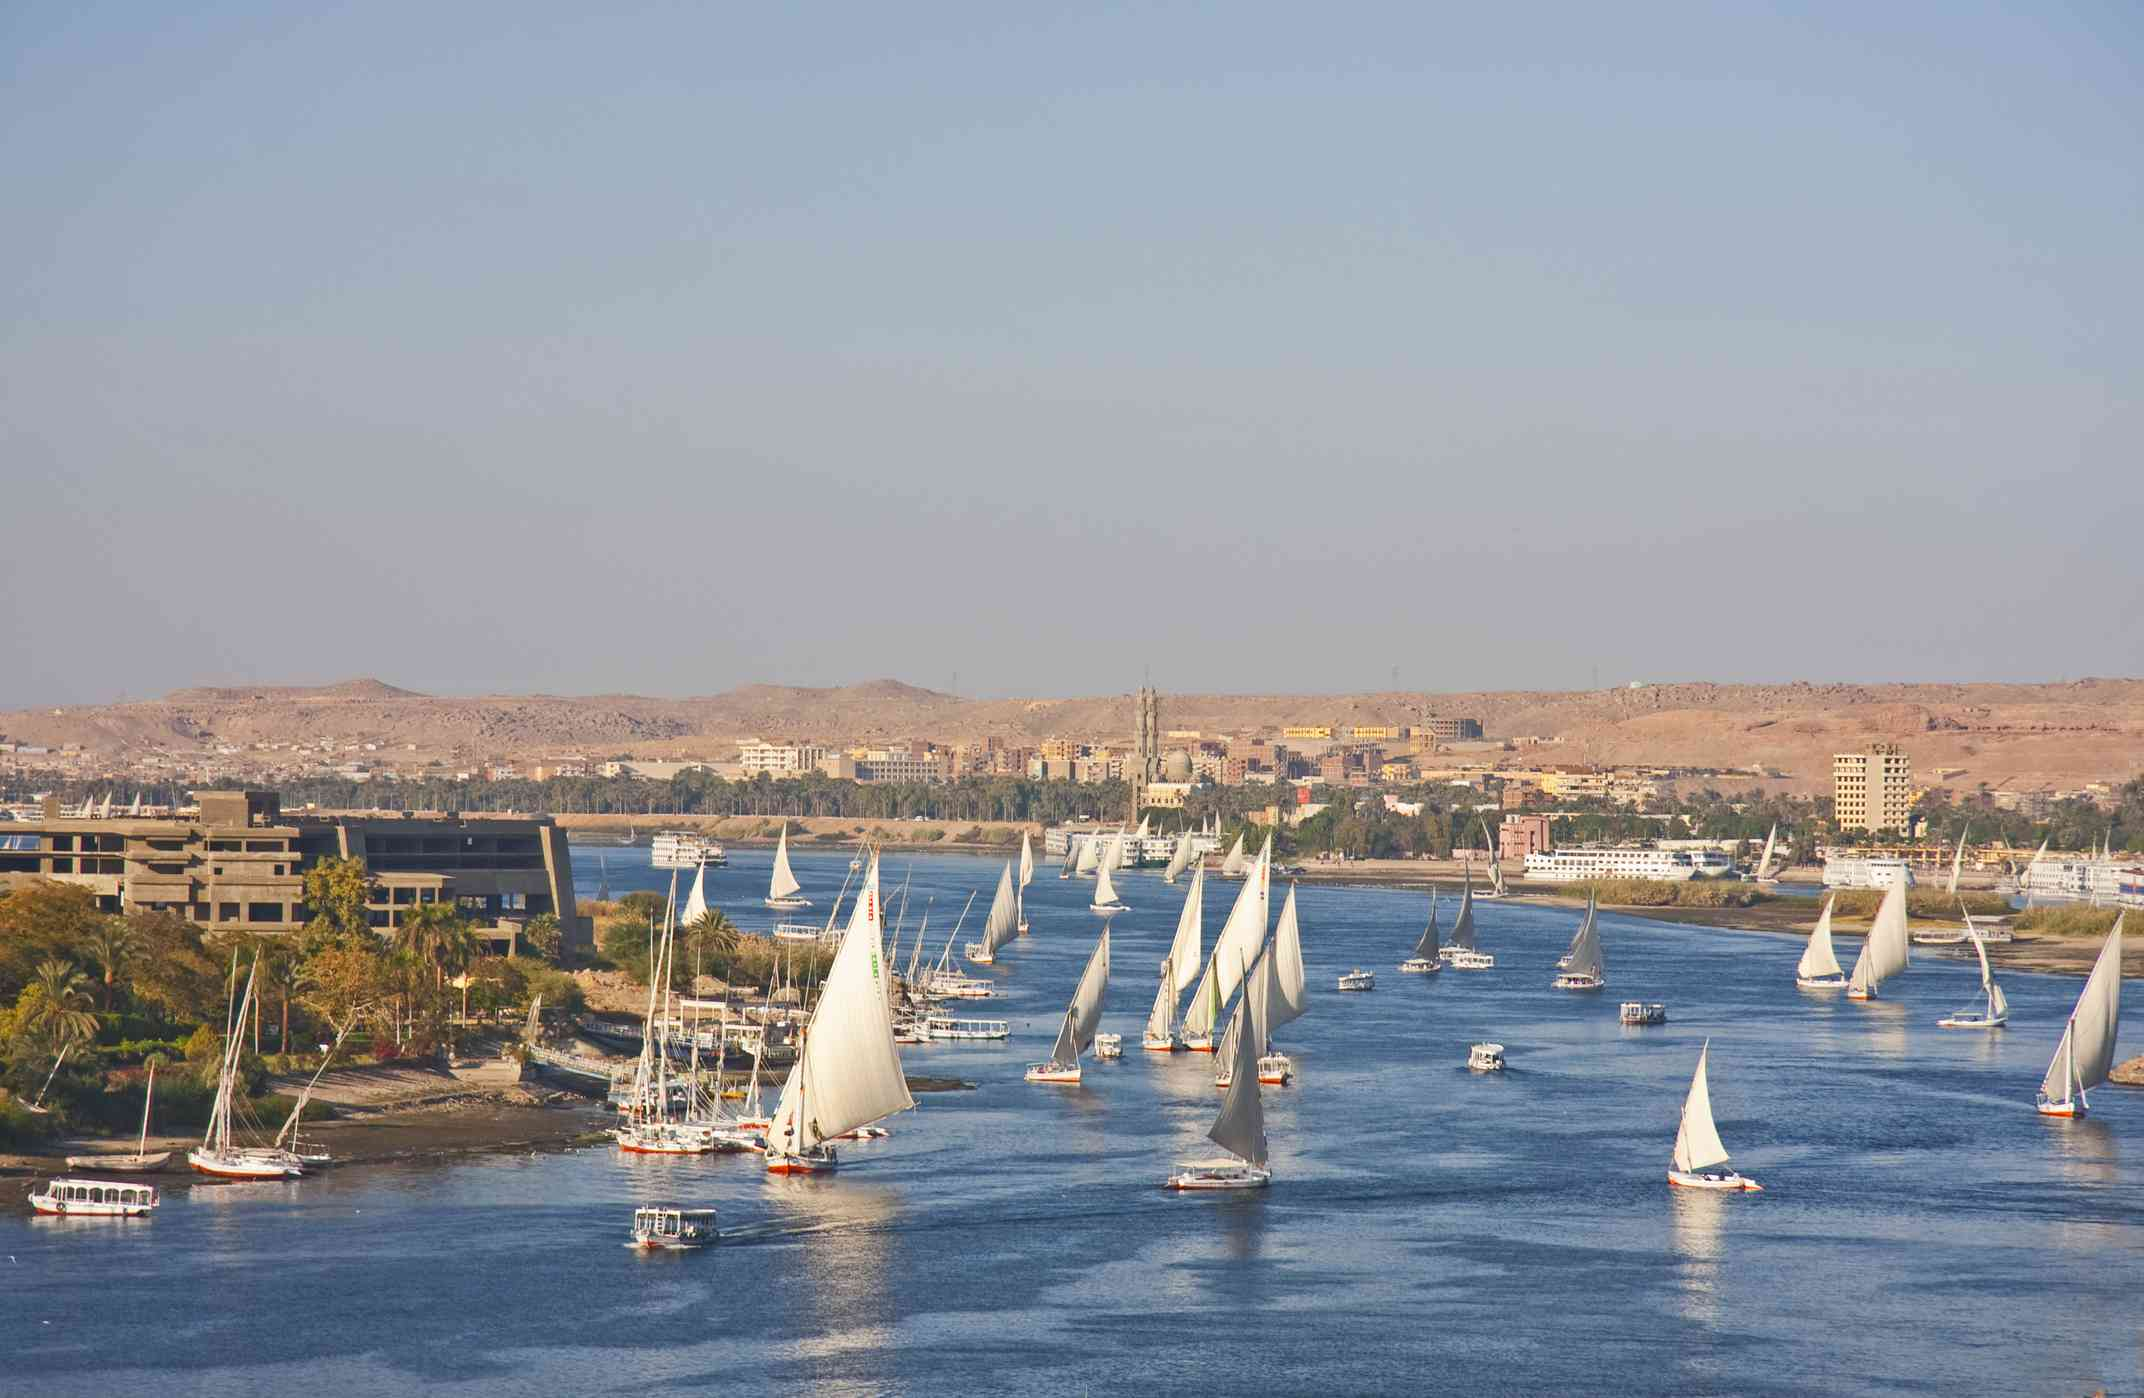 Boats sailing on the River Nile, Aswan